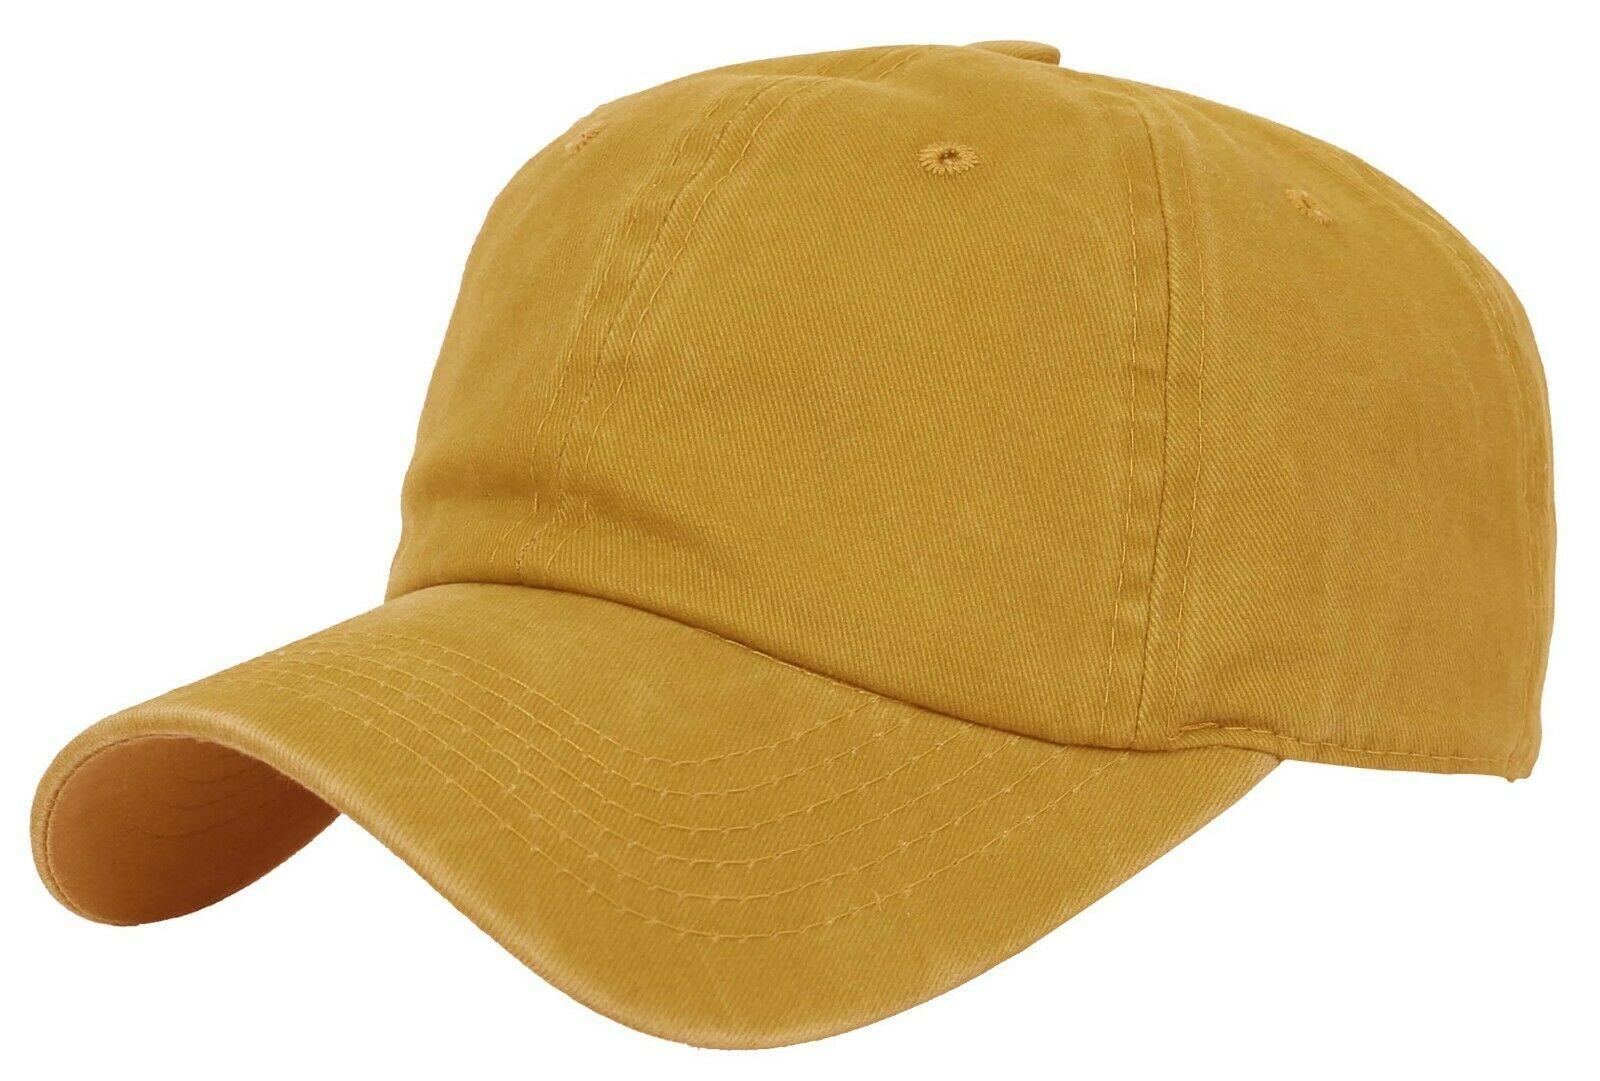 BASEBALL-CAP-Plain-Dad-Hat-Low-Profile-Vintage-Washed-Pigment-Adjustable thumbnail 24